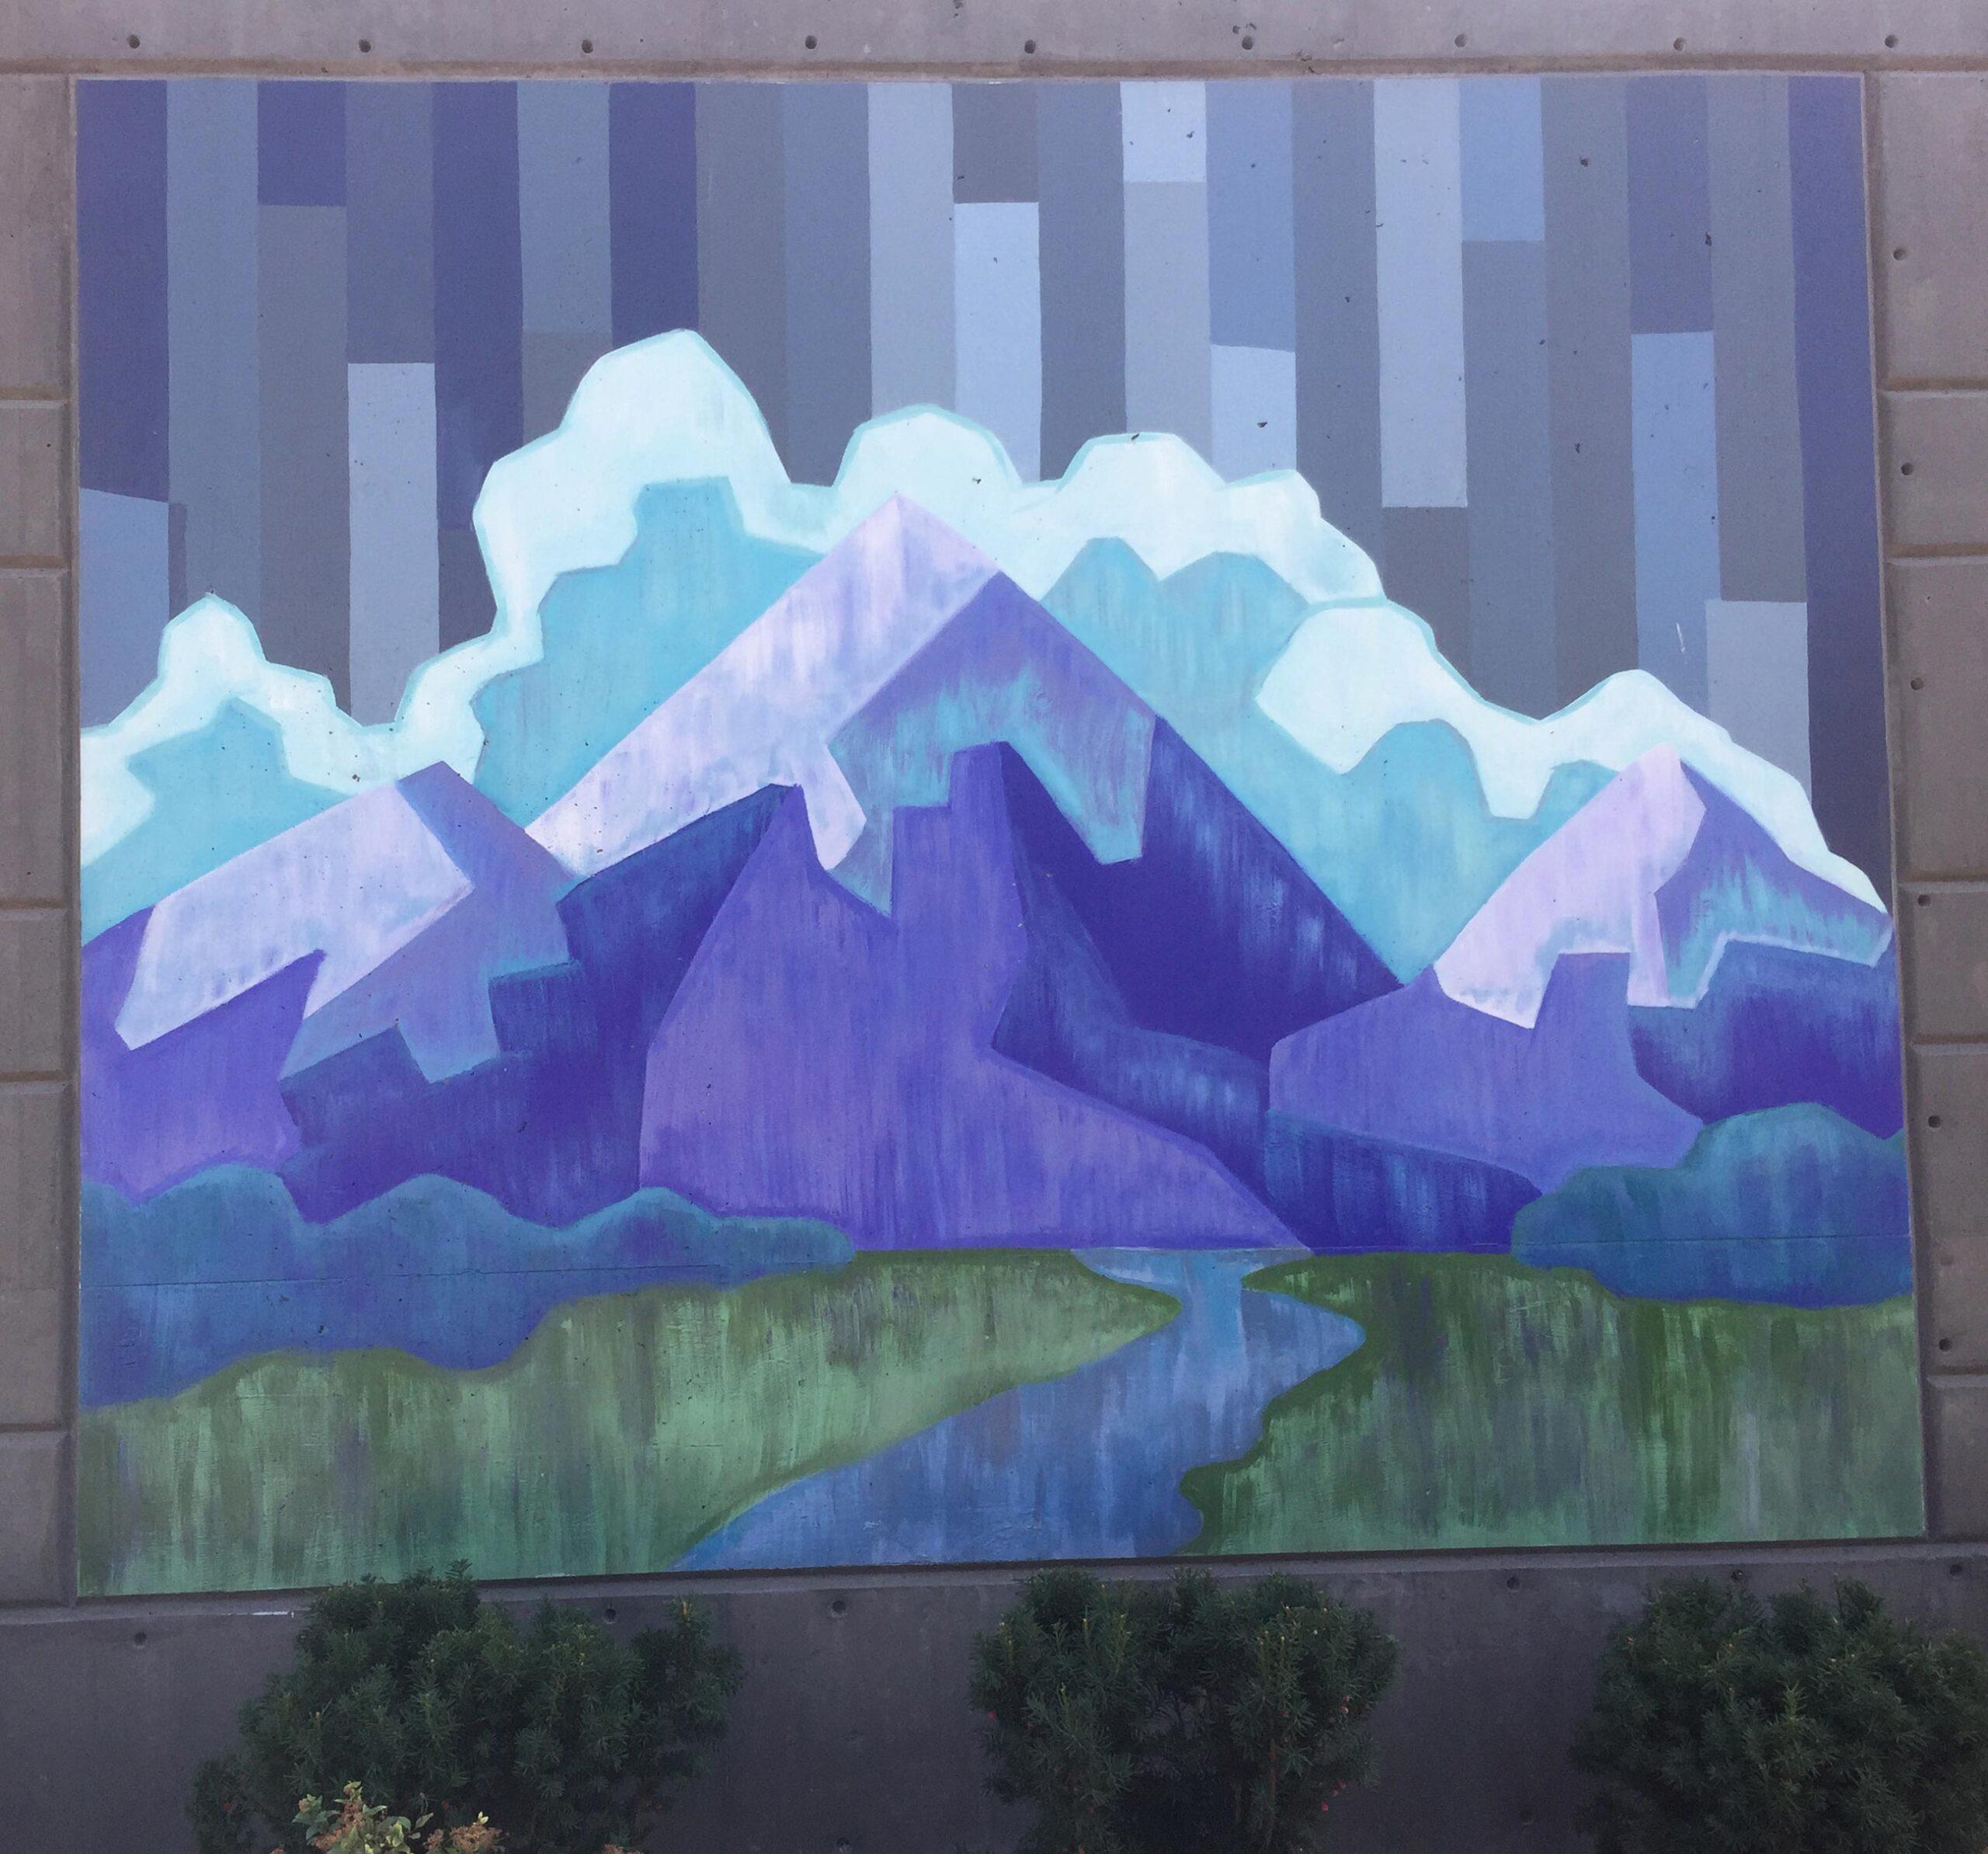 TITLE: Unknown (three peaks)